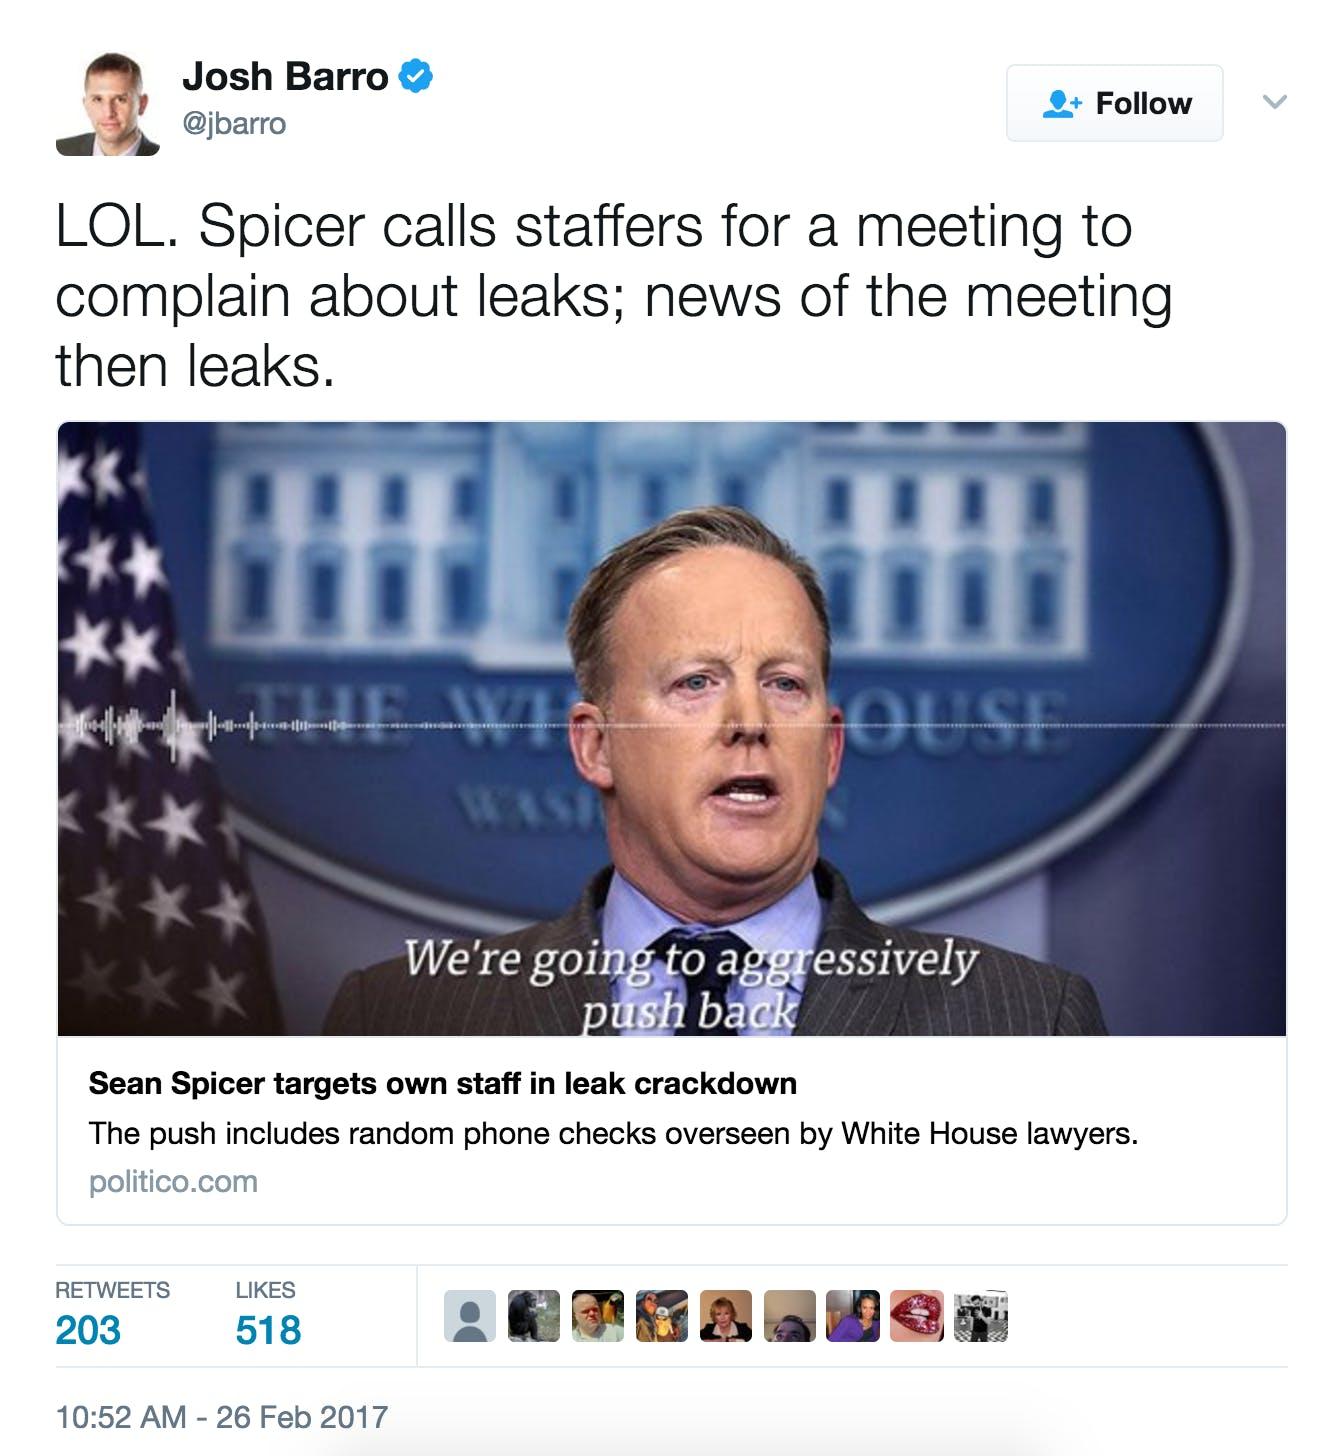 Sean Spicer leaks meme